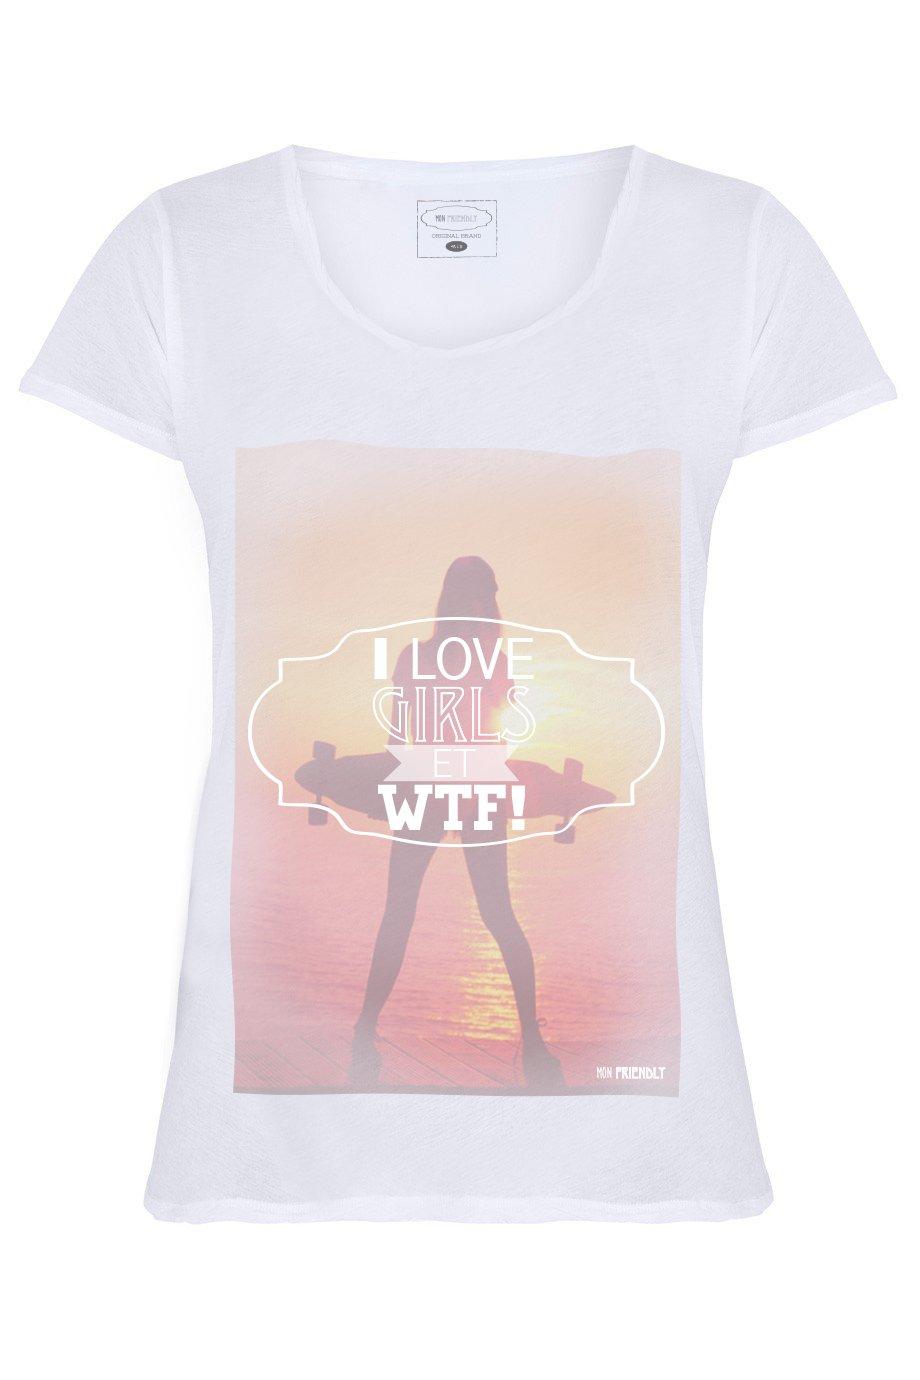 I love girls et WTF